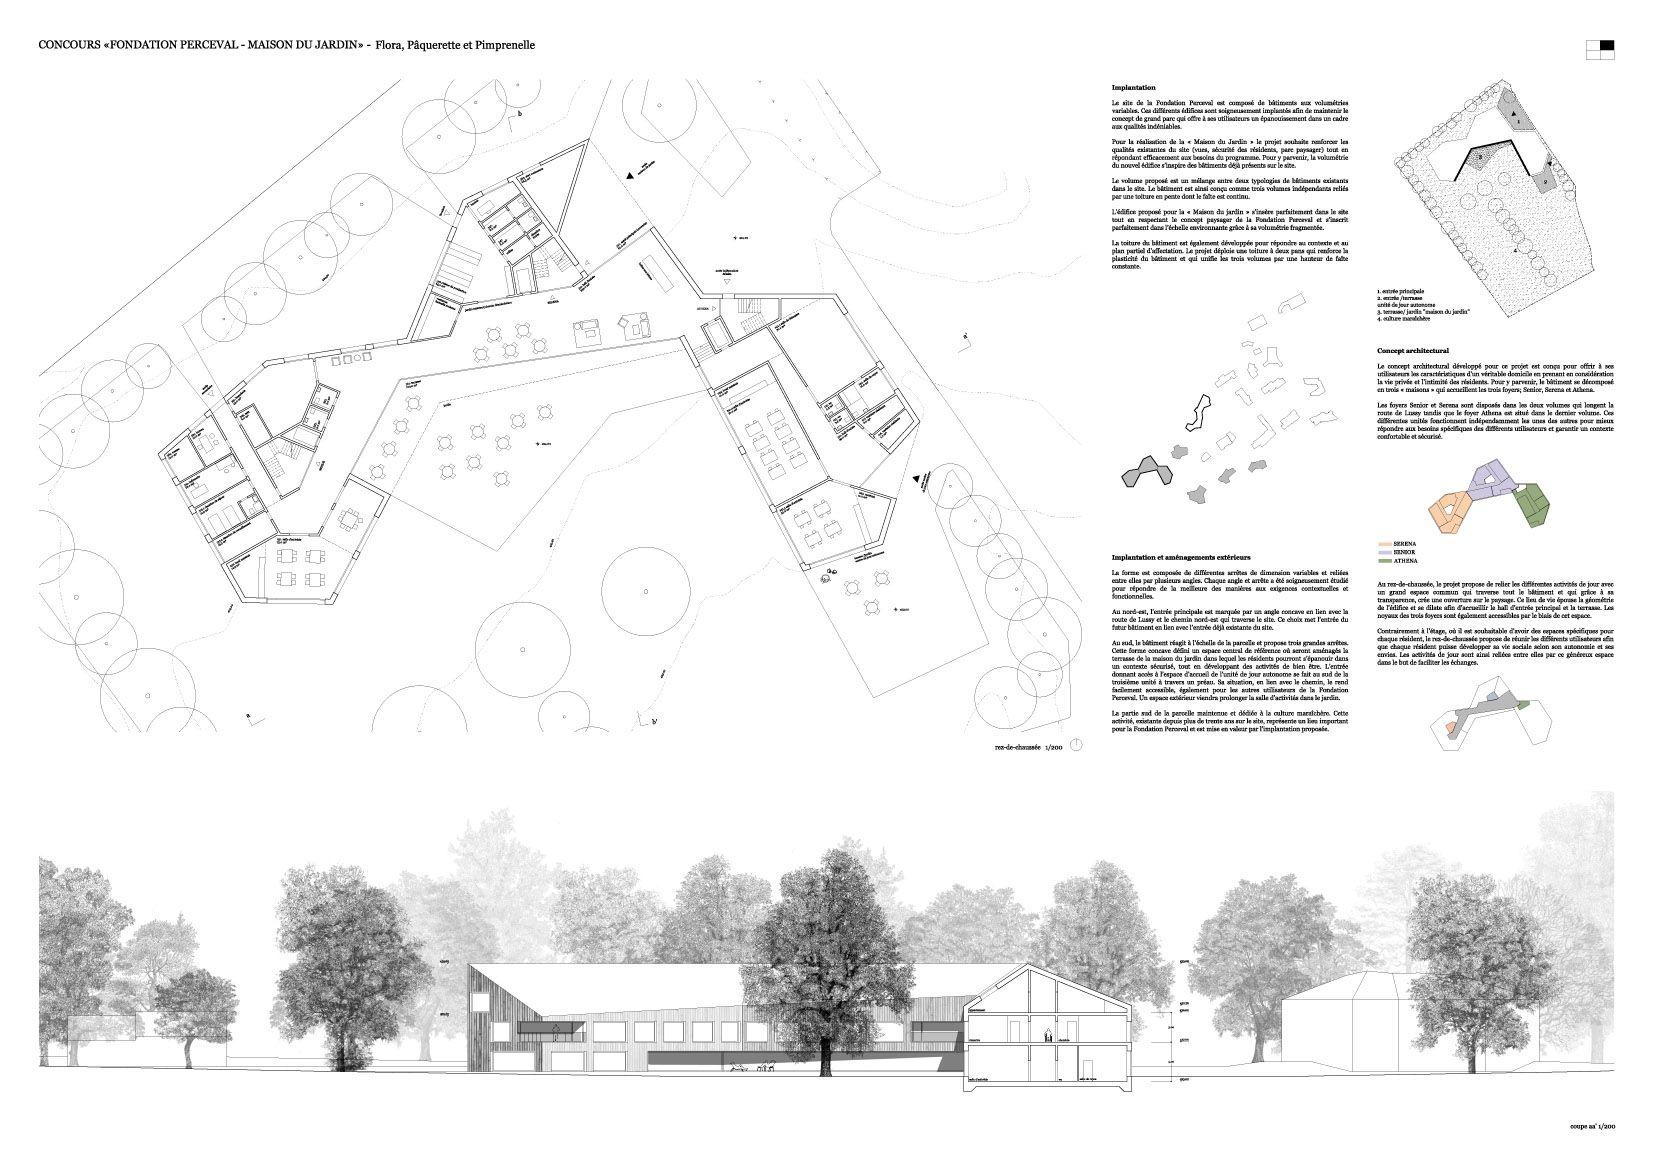 GNWA Wettbwerbsbeiträge Pinterest - Plan maison entree sud